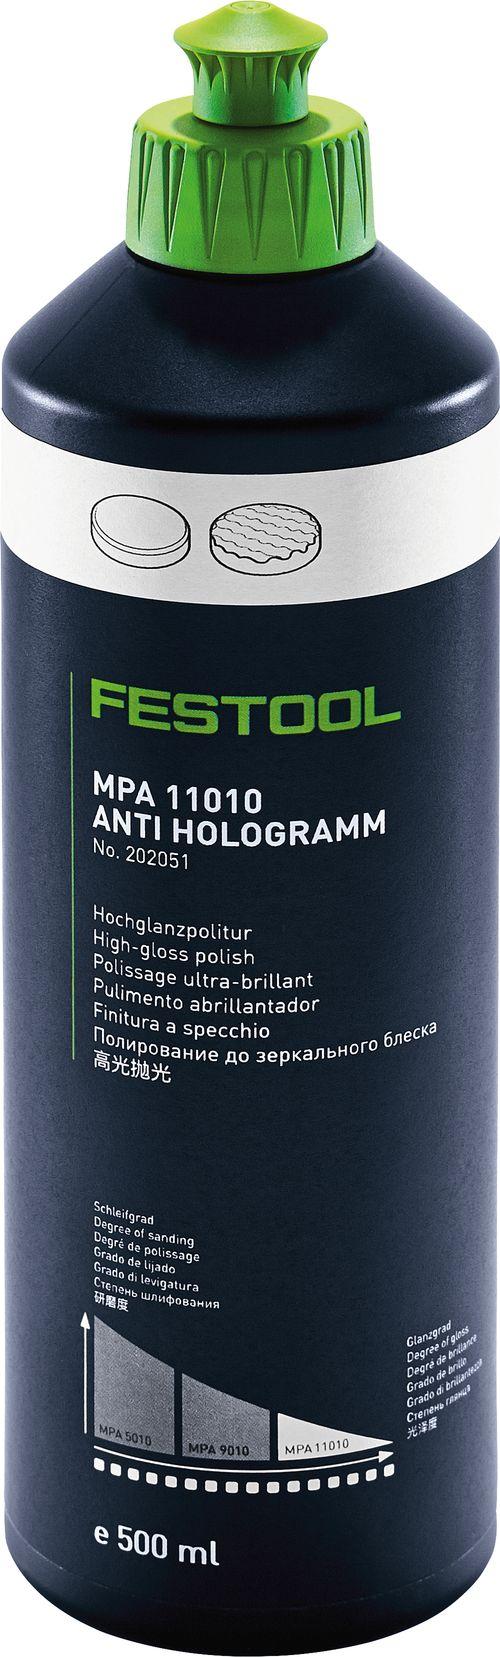 Festool Produto para polimento MPA 11010 WH/0,5L